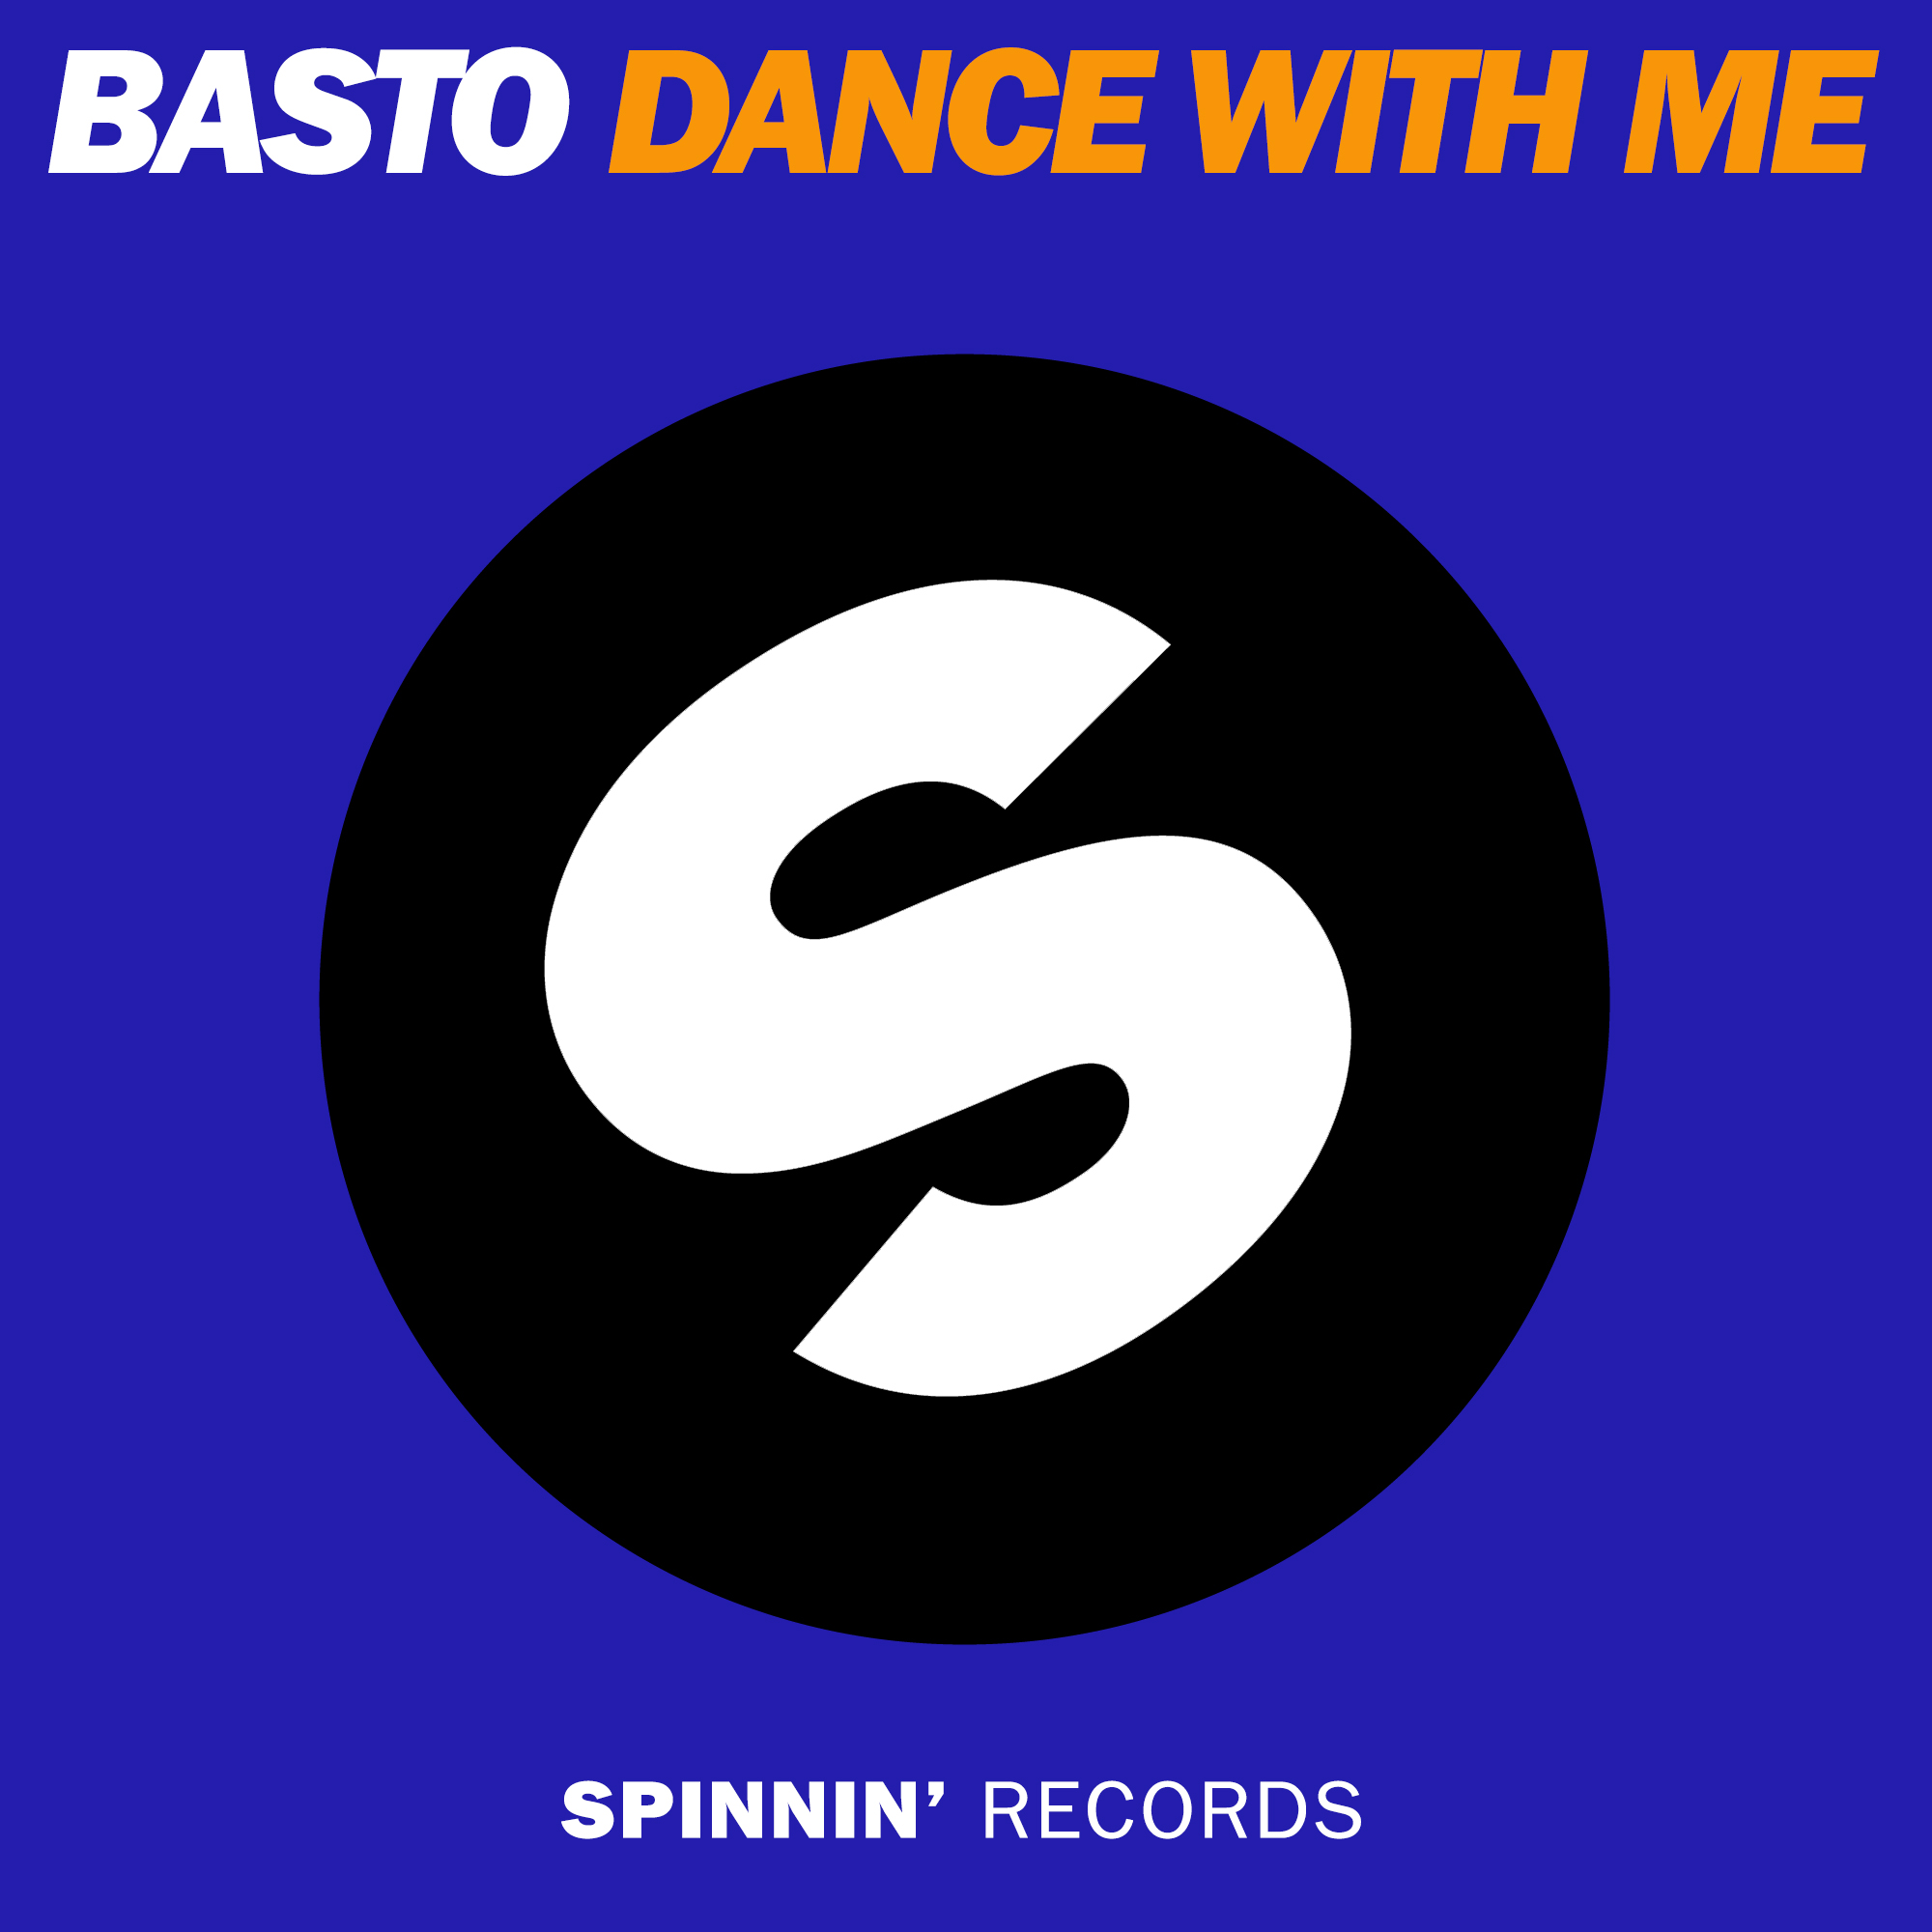 basto dance with me original mix preview your edm. Black Bedroom Furniture Sets. Home Design Ideas